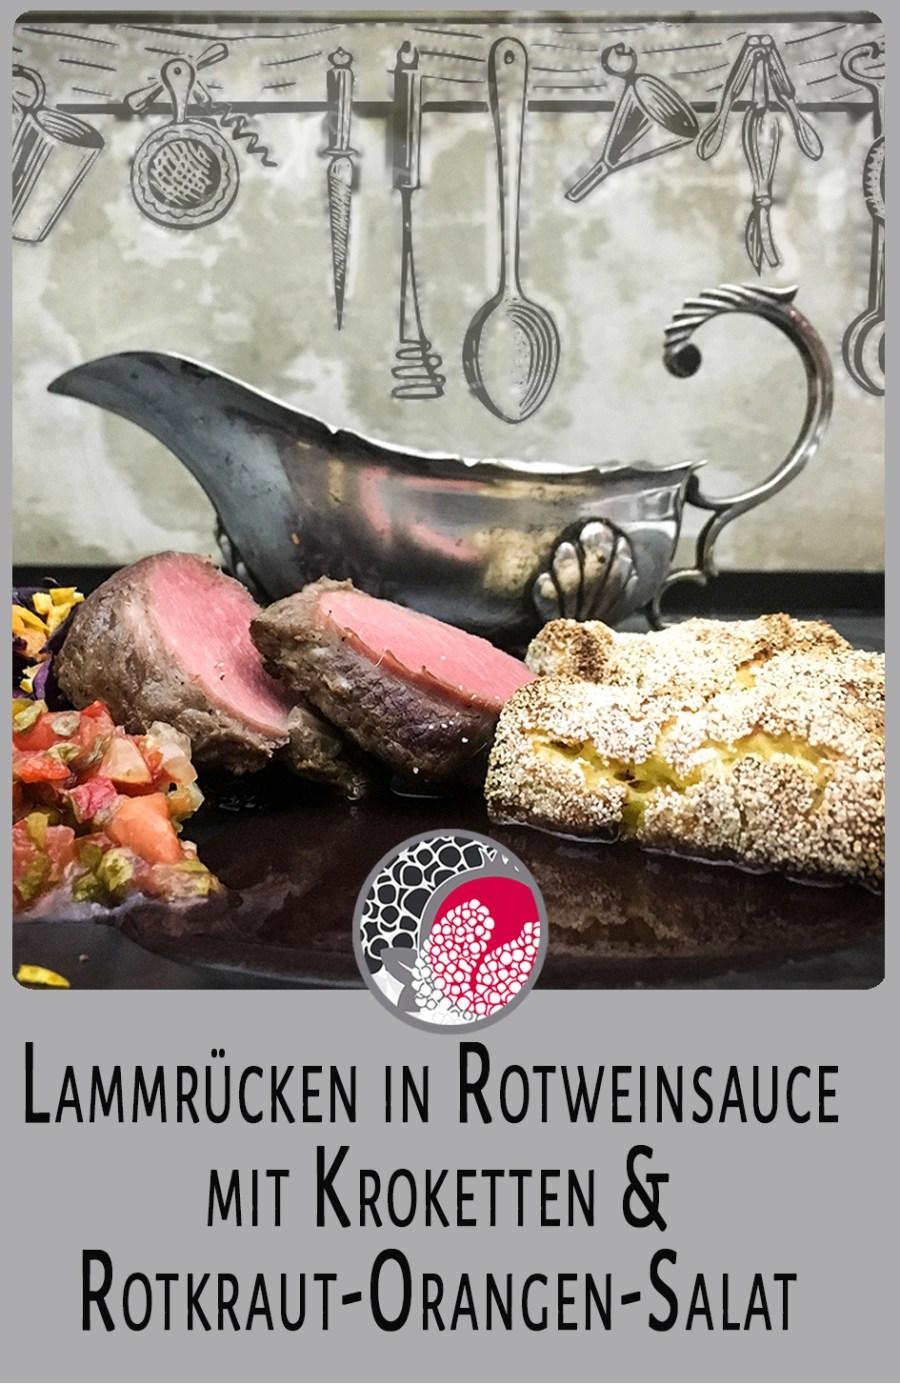 Lammrücken Rotweinsauce Rotkraut Orangen Salat saddle of lamb